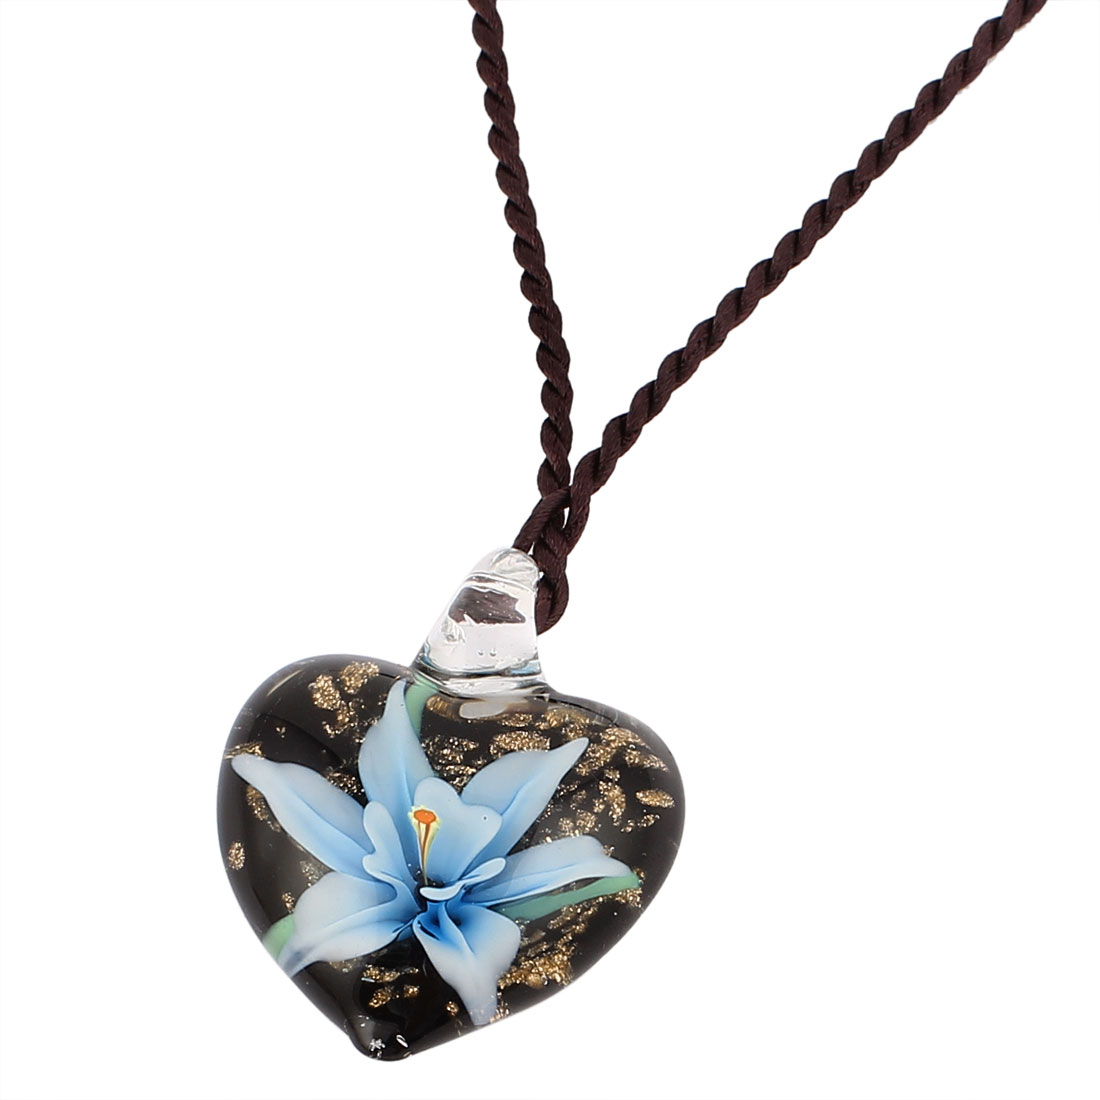 Heart Shape Glass Pressed Floral Pendant Necklace Neckwear Blue Black